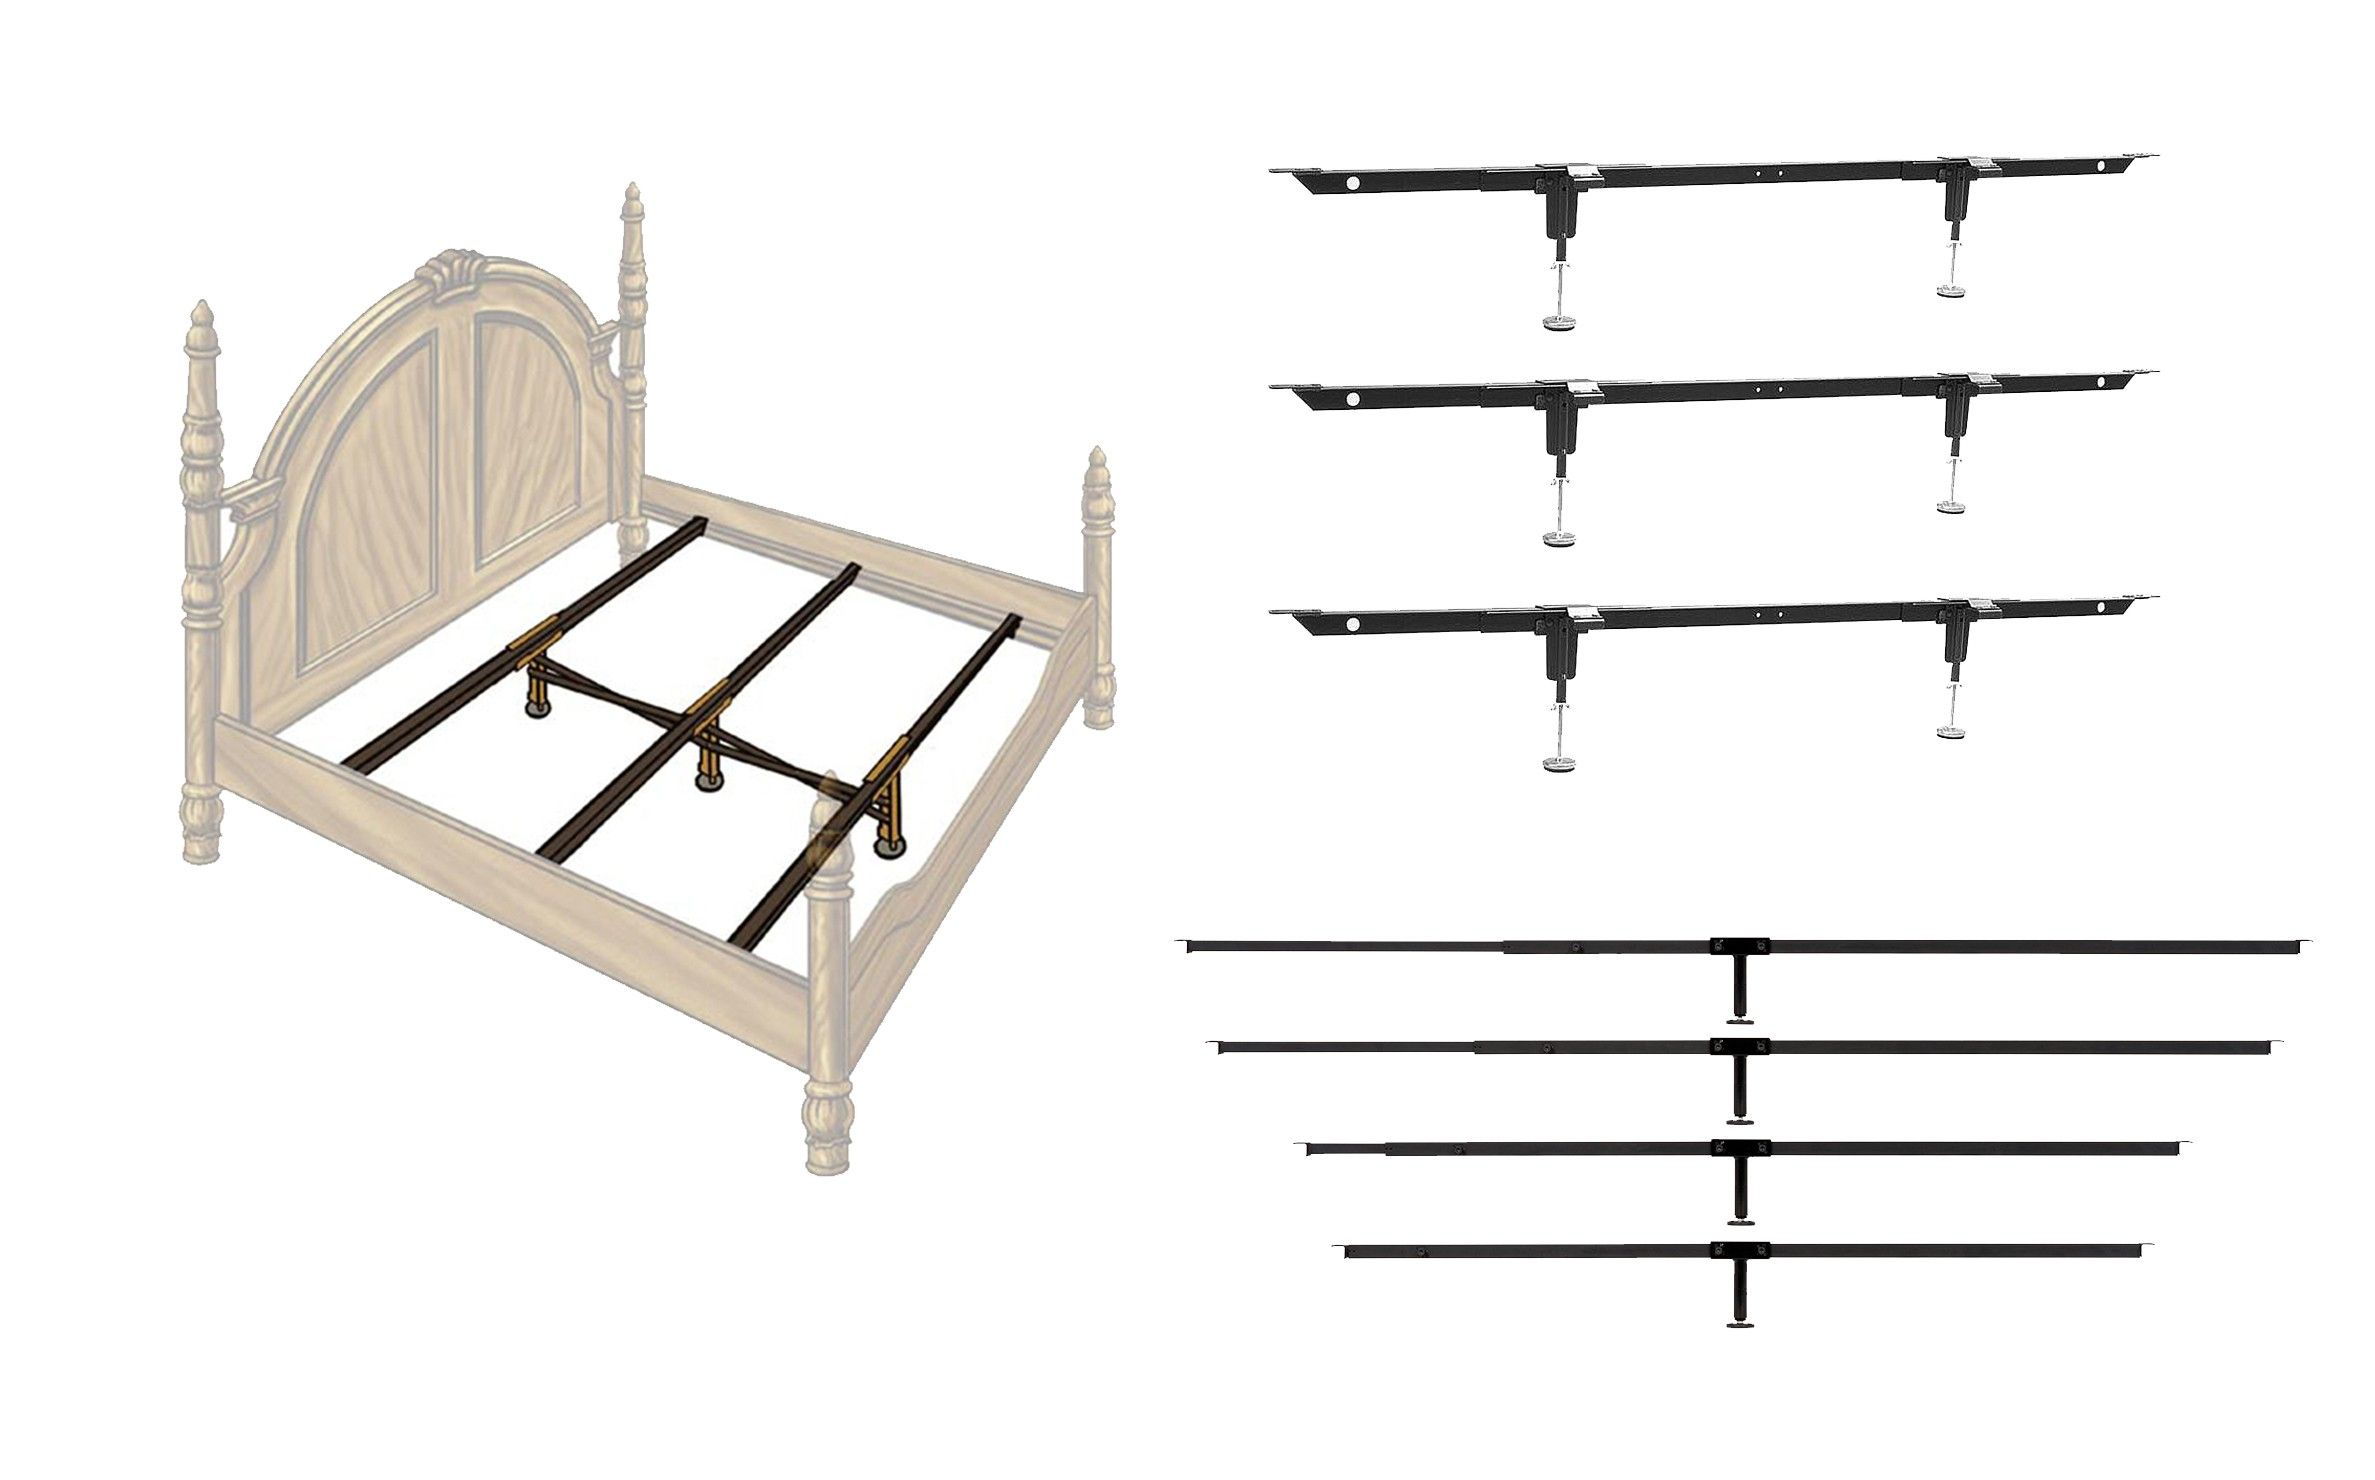 Tuffing loft bed ideas   Fresh Broyhill Fontana King Bed Frame  Bedroom Ideas Inspiration